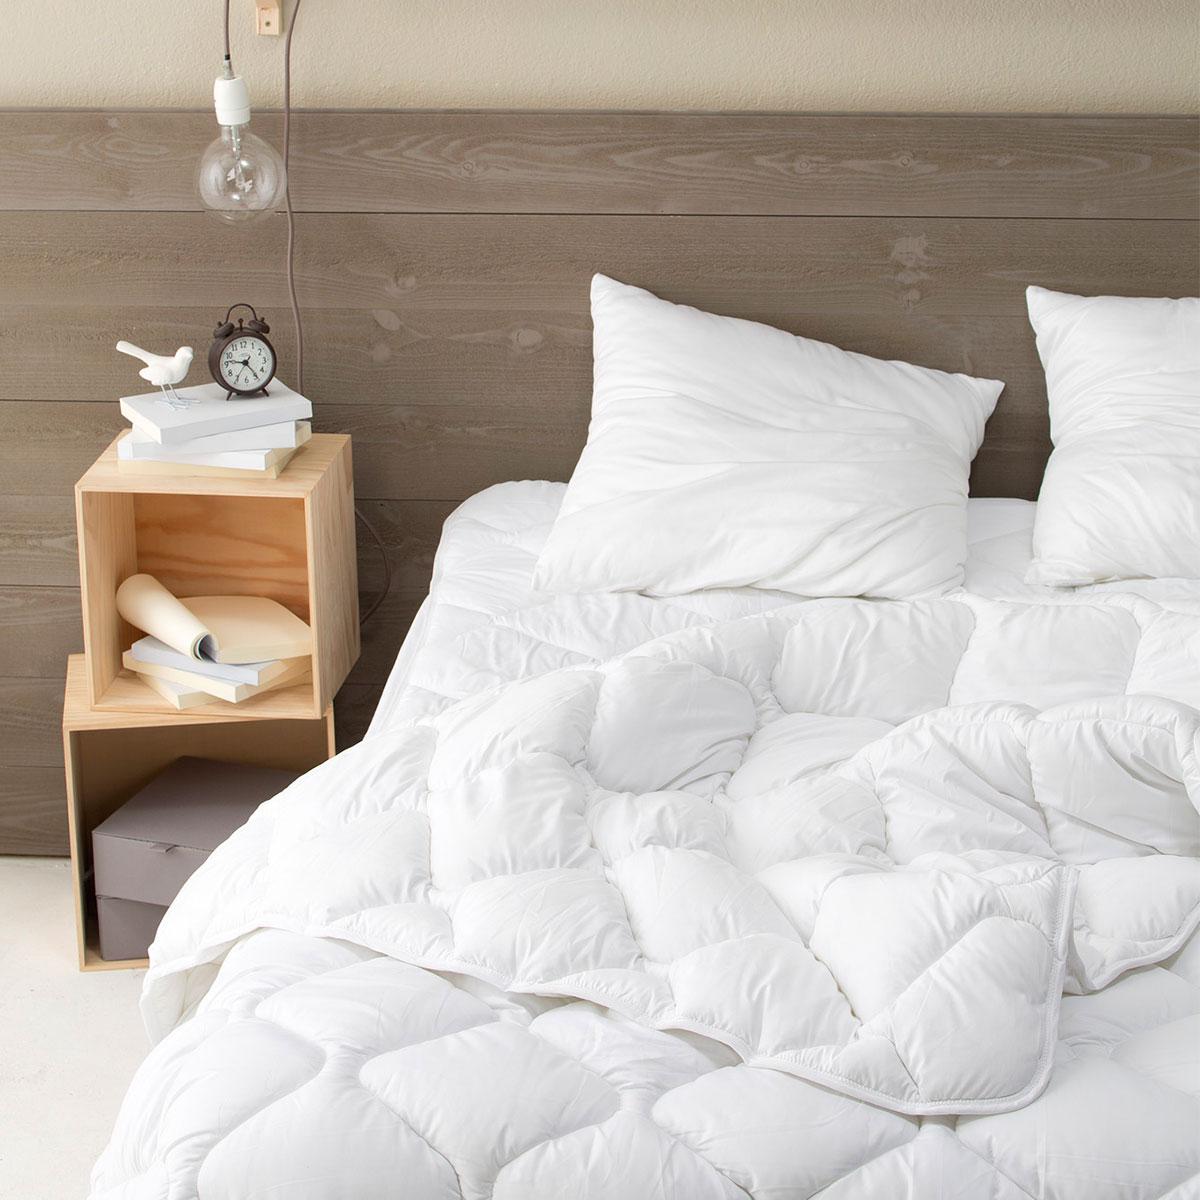 couette sunny siesta 400 g m standard textile. Black Bedroom Furniture Sets. Home Design Ideas